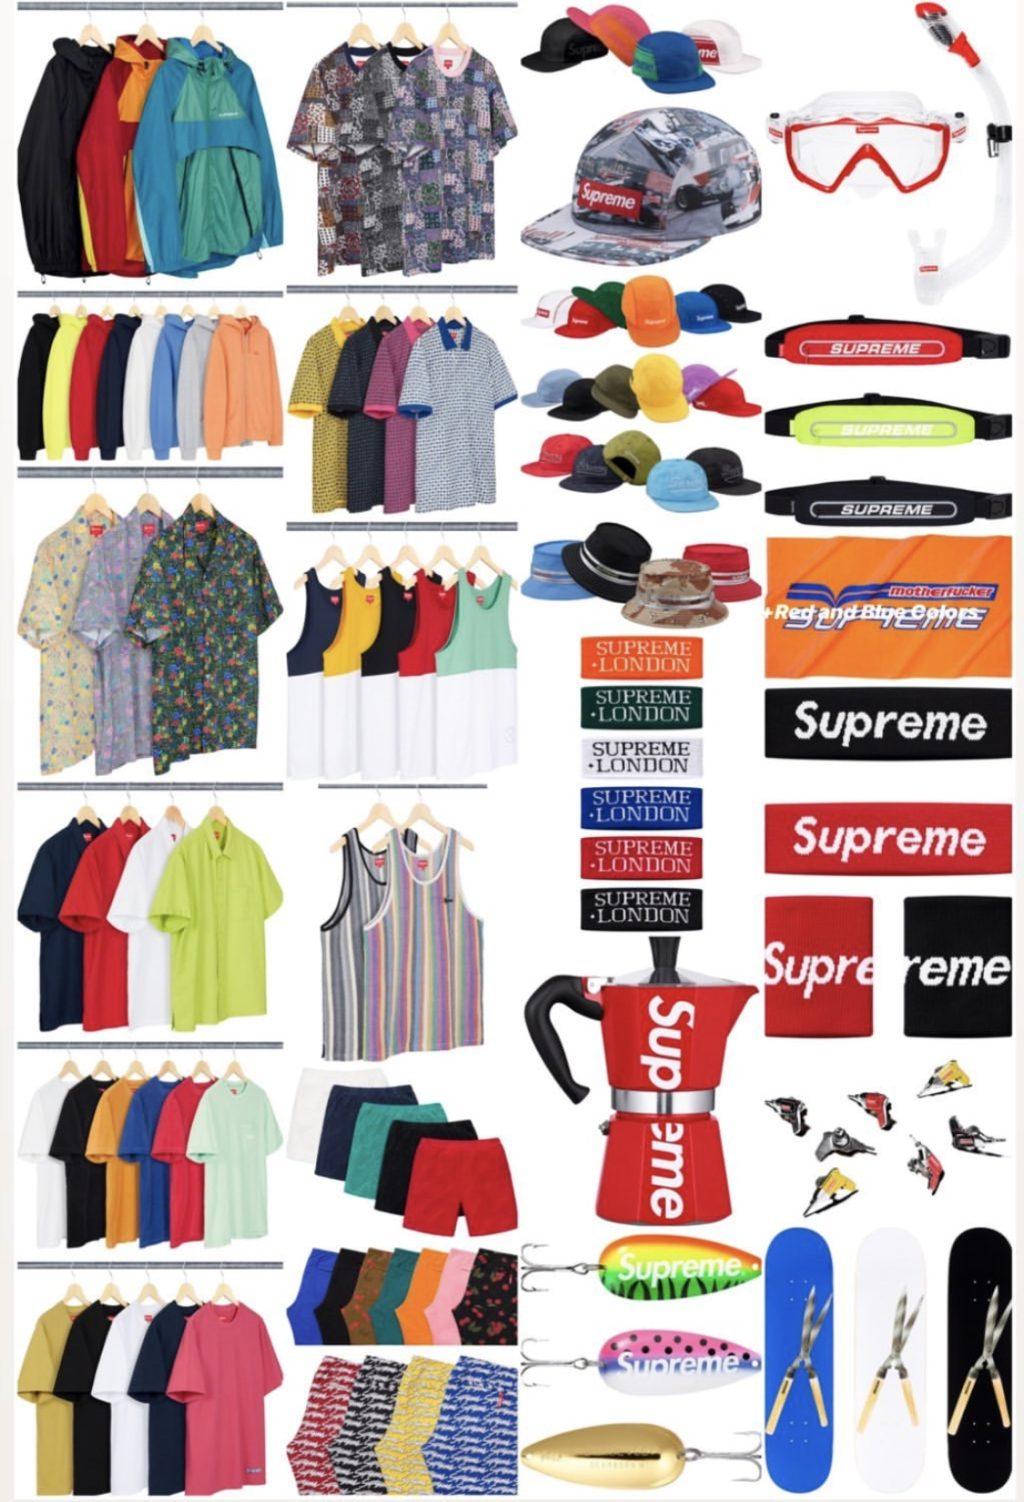 supreme-19ss-week18-items